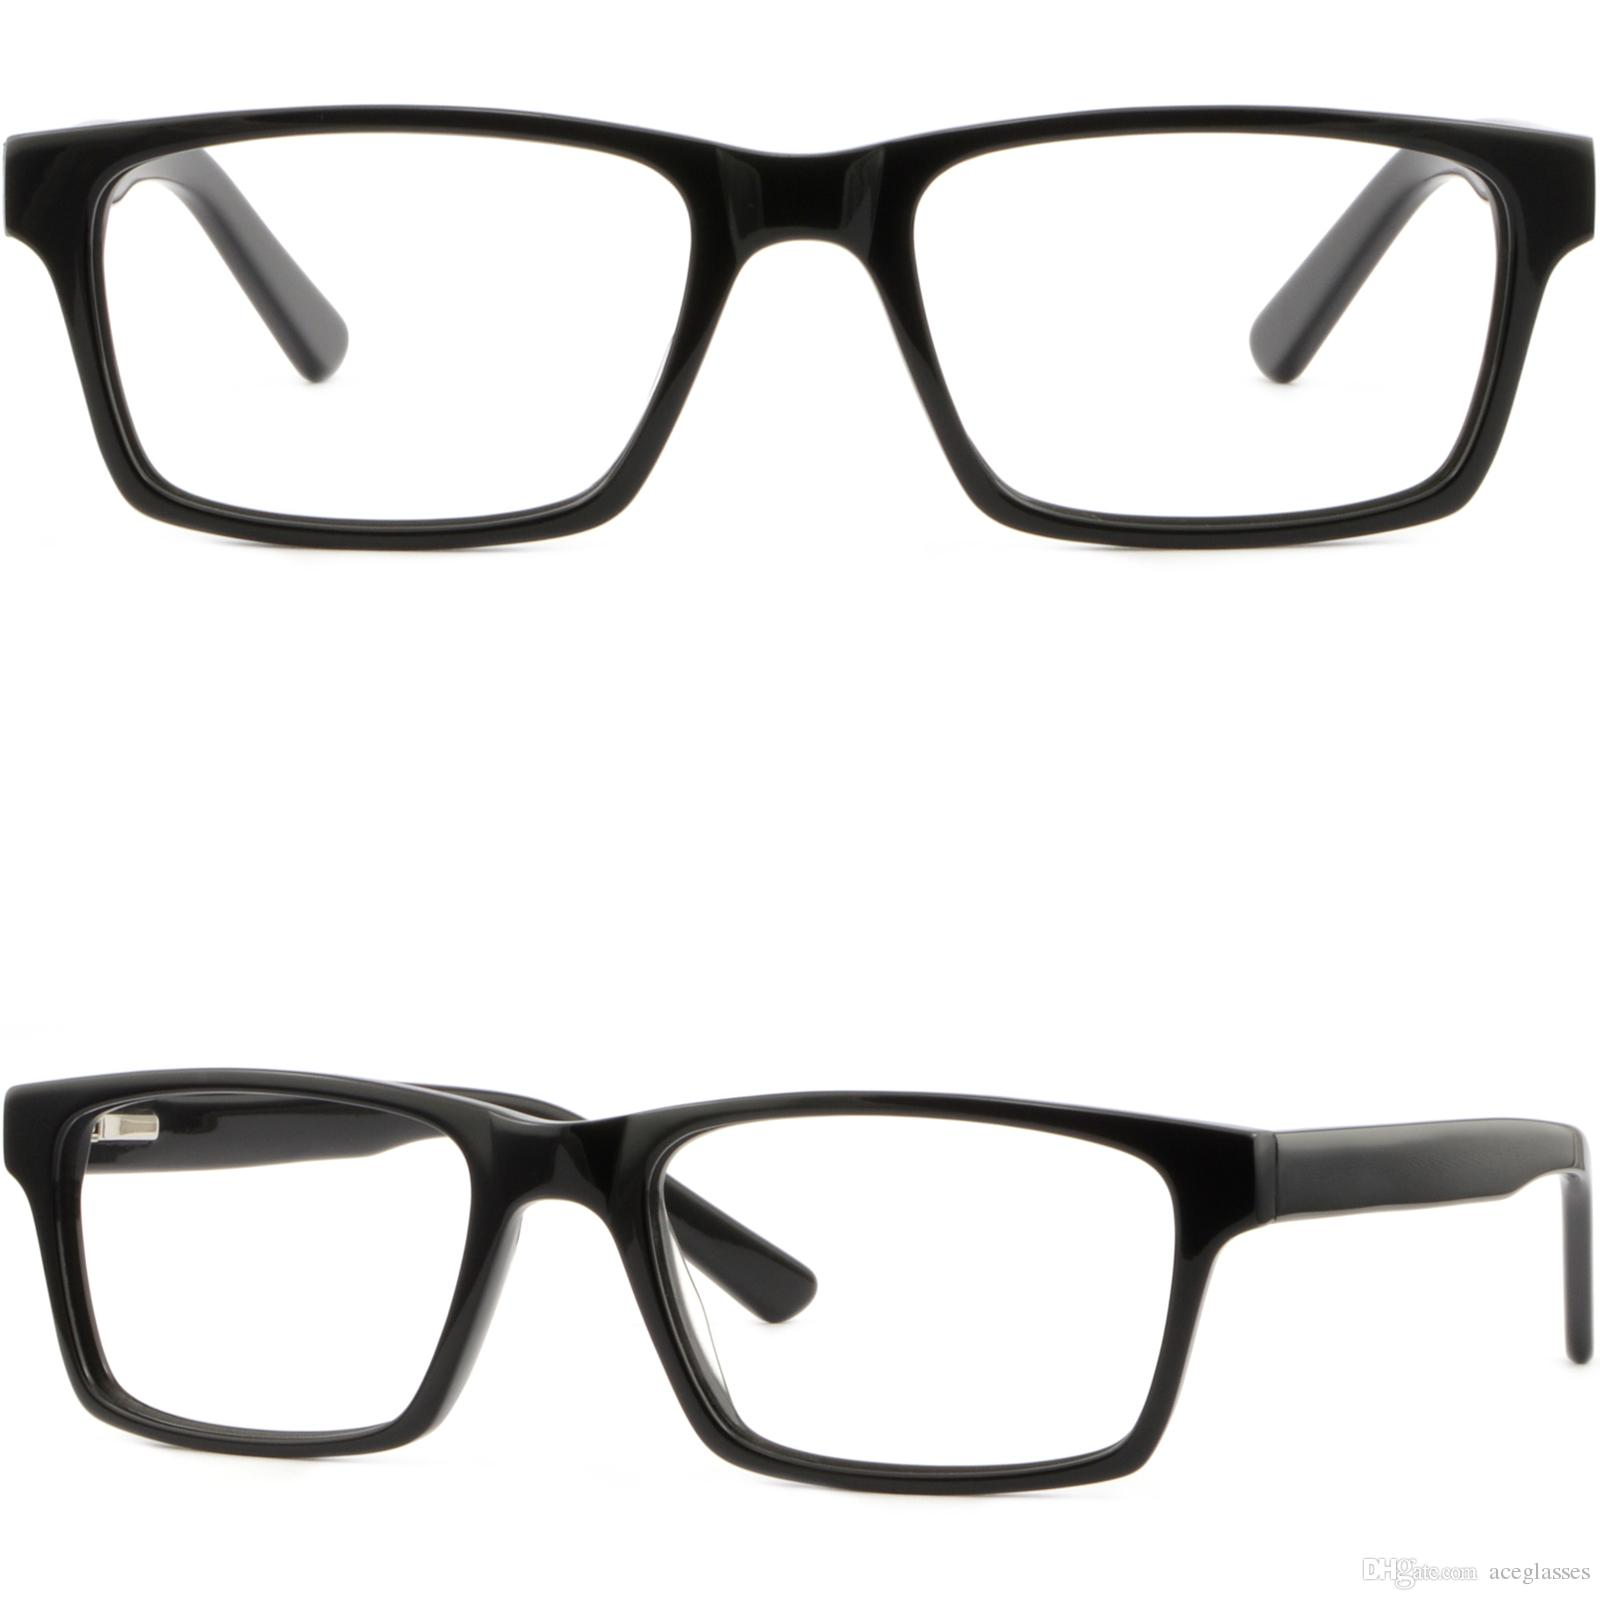 rectangle mens womens plastic frames prescription glasses rectangular eyeglasses discount designer eyeglass frames discount eyeglasses frames from - Womens Frames